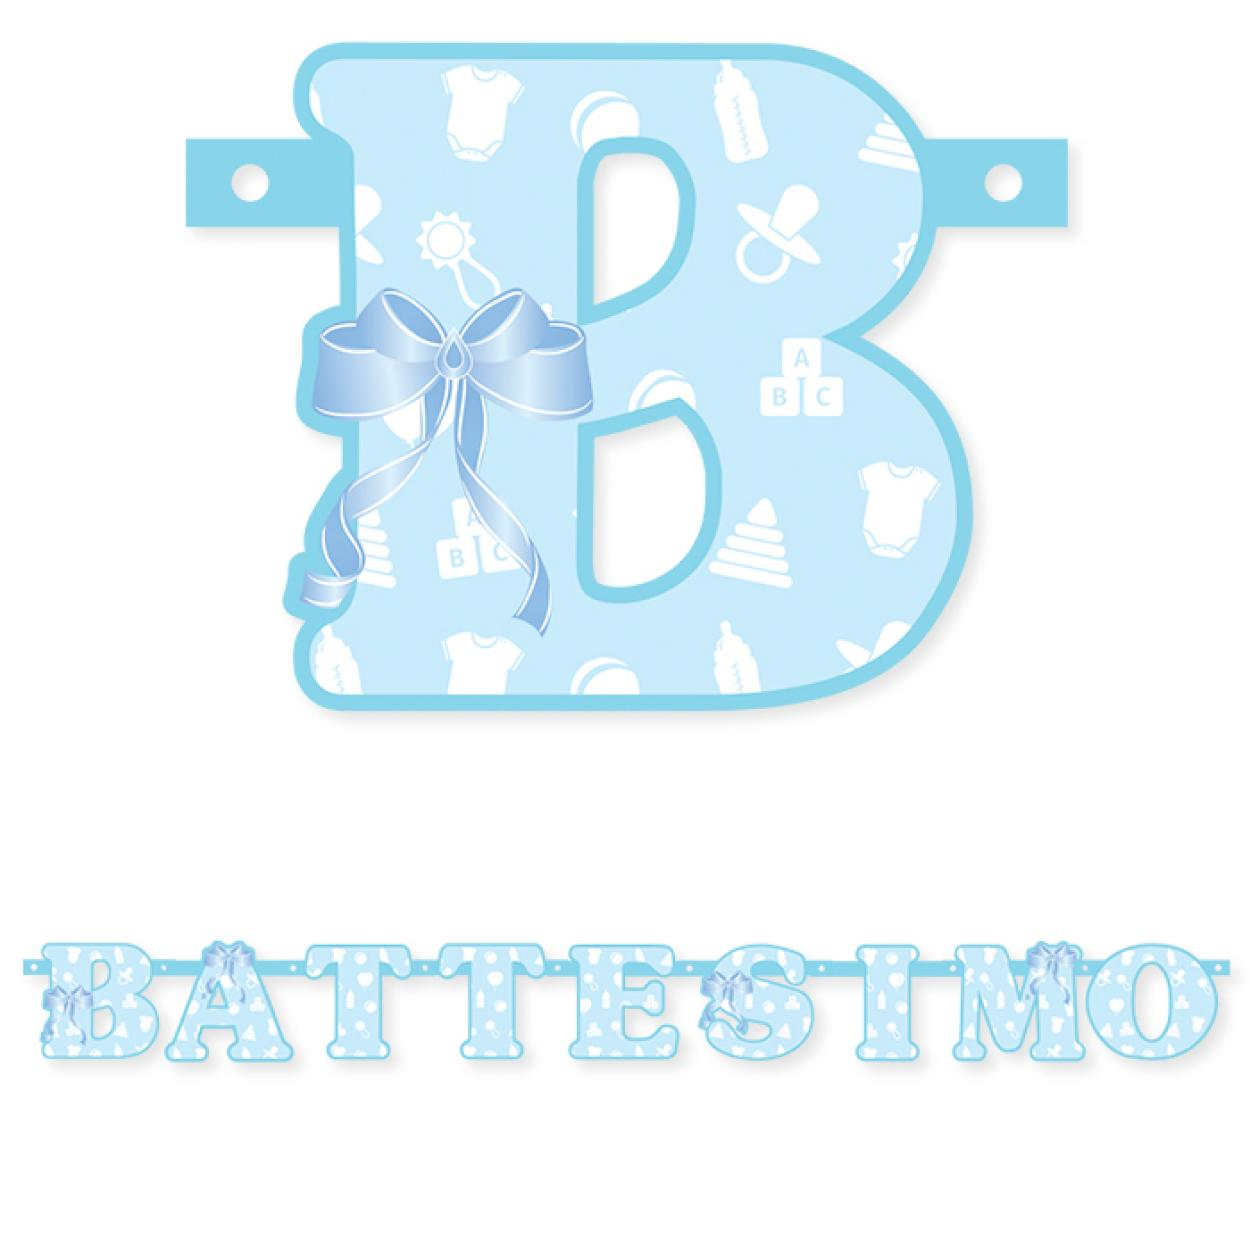 FESTONE BATTESIMO CELESTE MT.1.35 74403